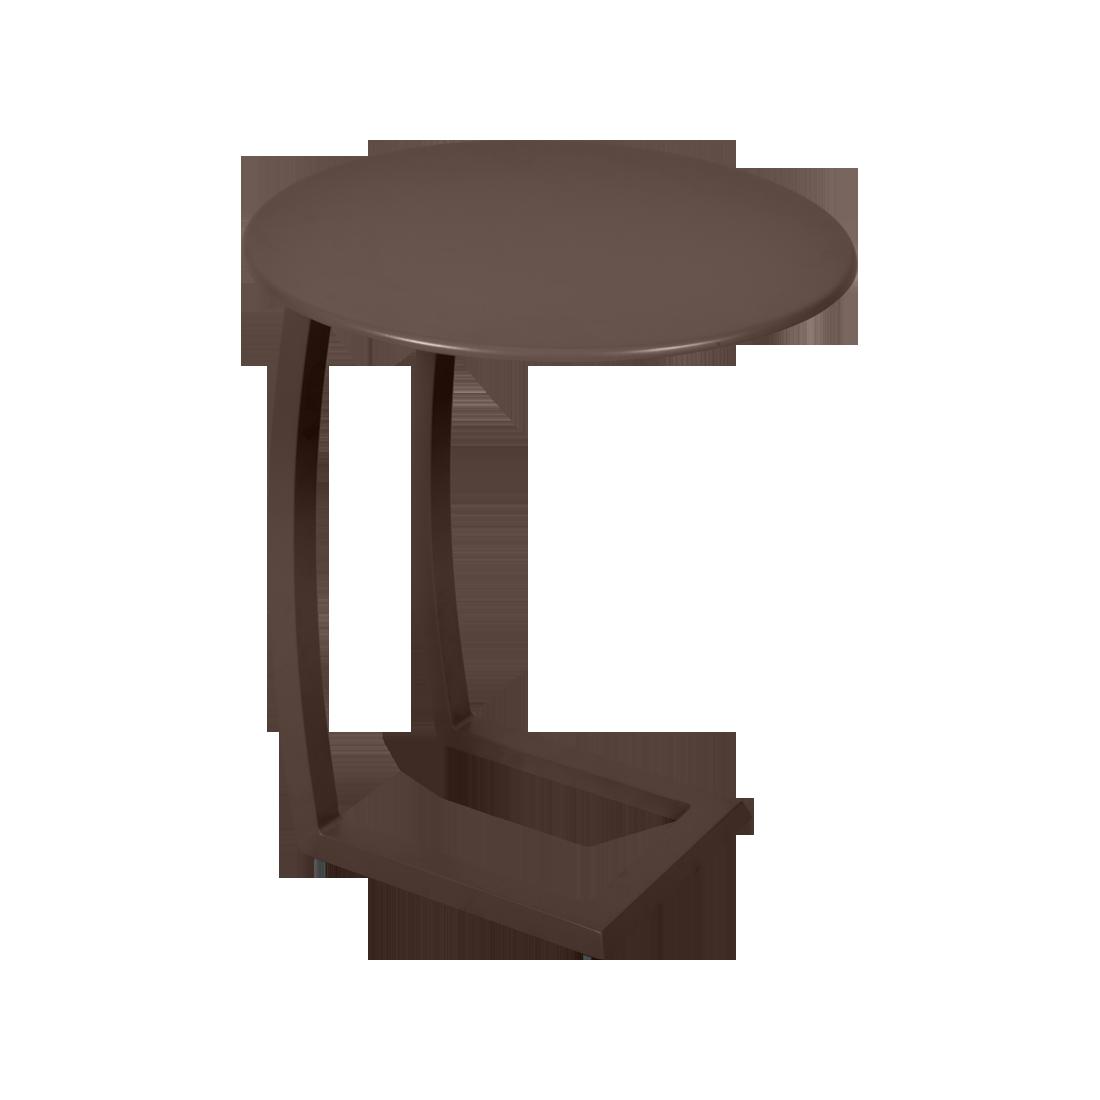 table basse chaise longue marron, table basse aluminium, table basse bain de soleil